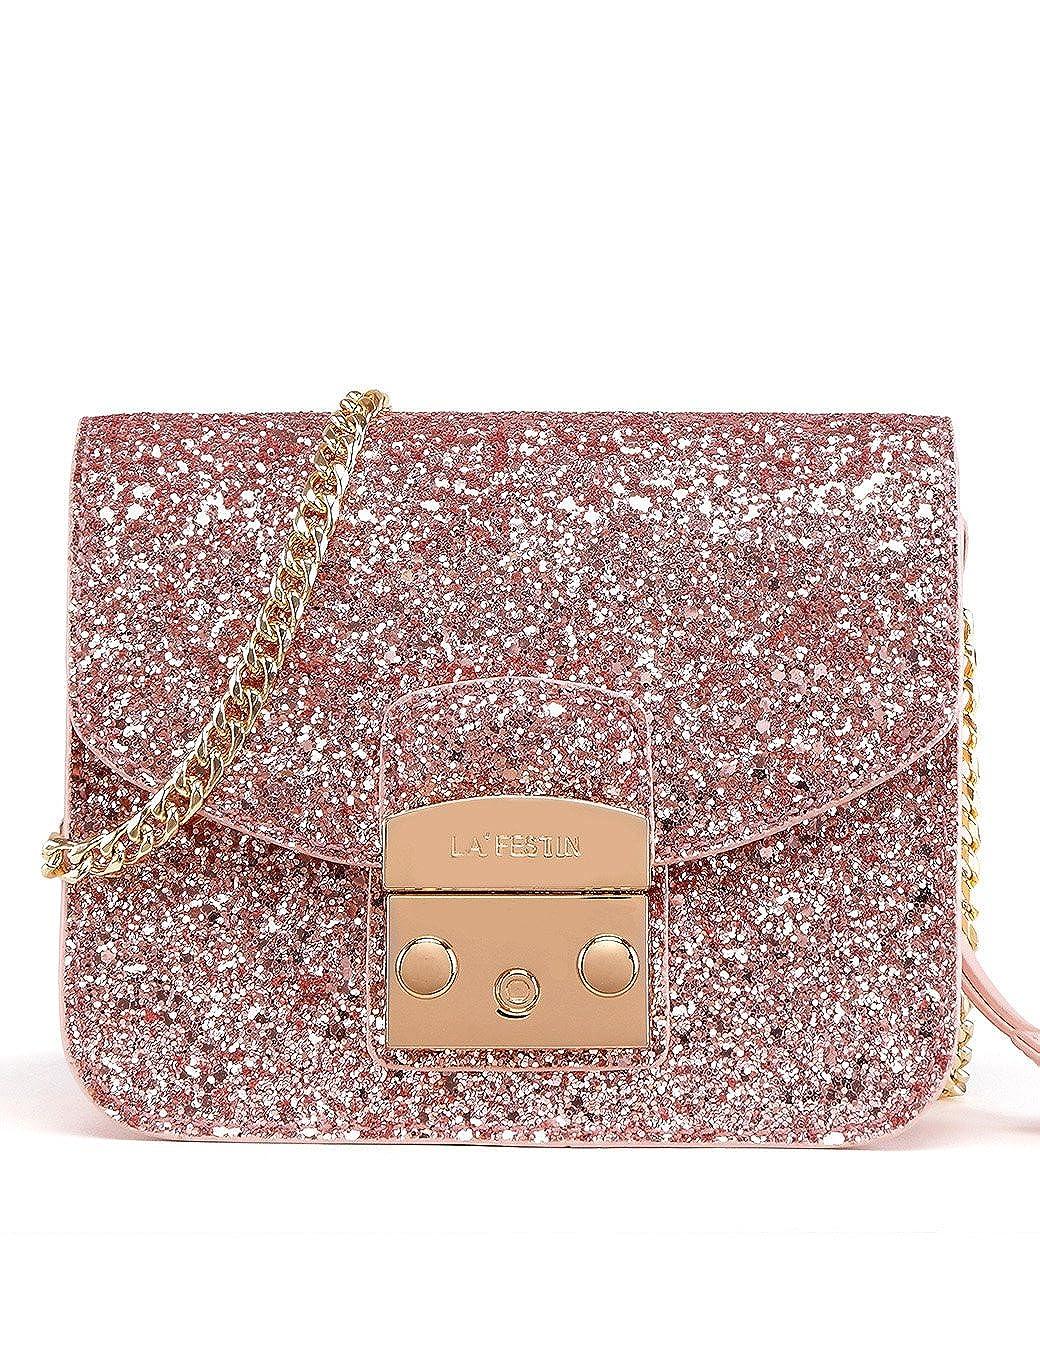 d1ae8cae5957 LA'FESTIN Messenger Side Bag for Women Mini Cute Sparkly Leather Shoulder  Purses with Chain Strap